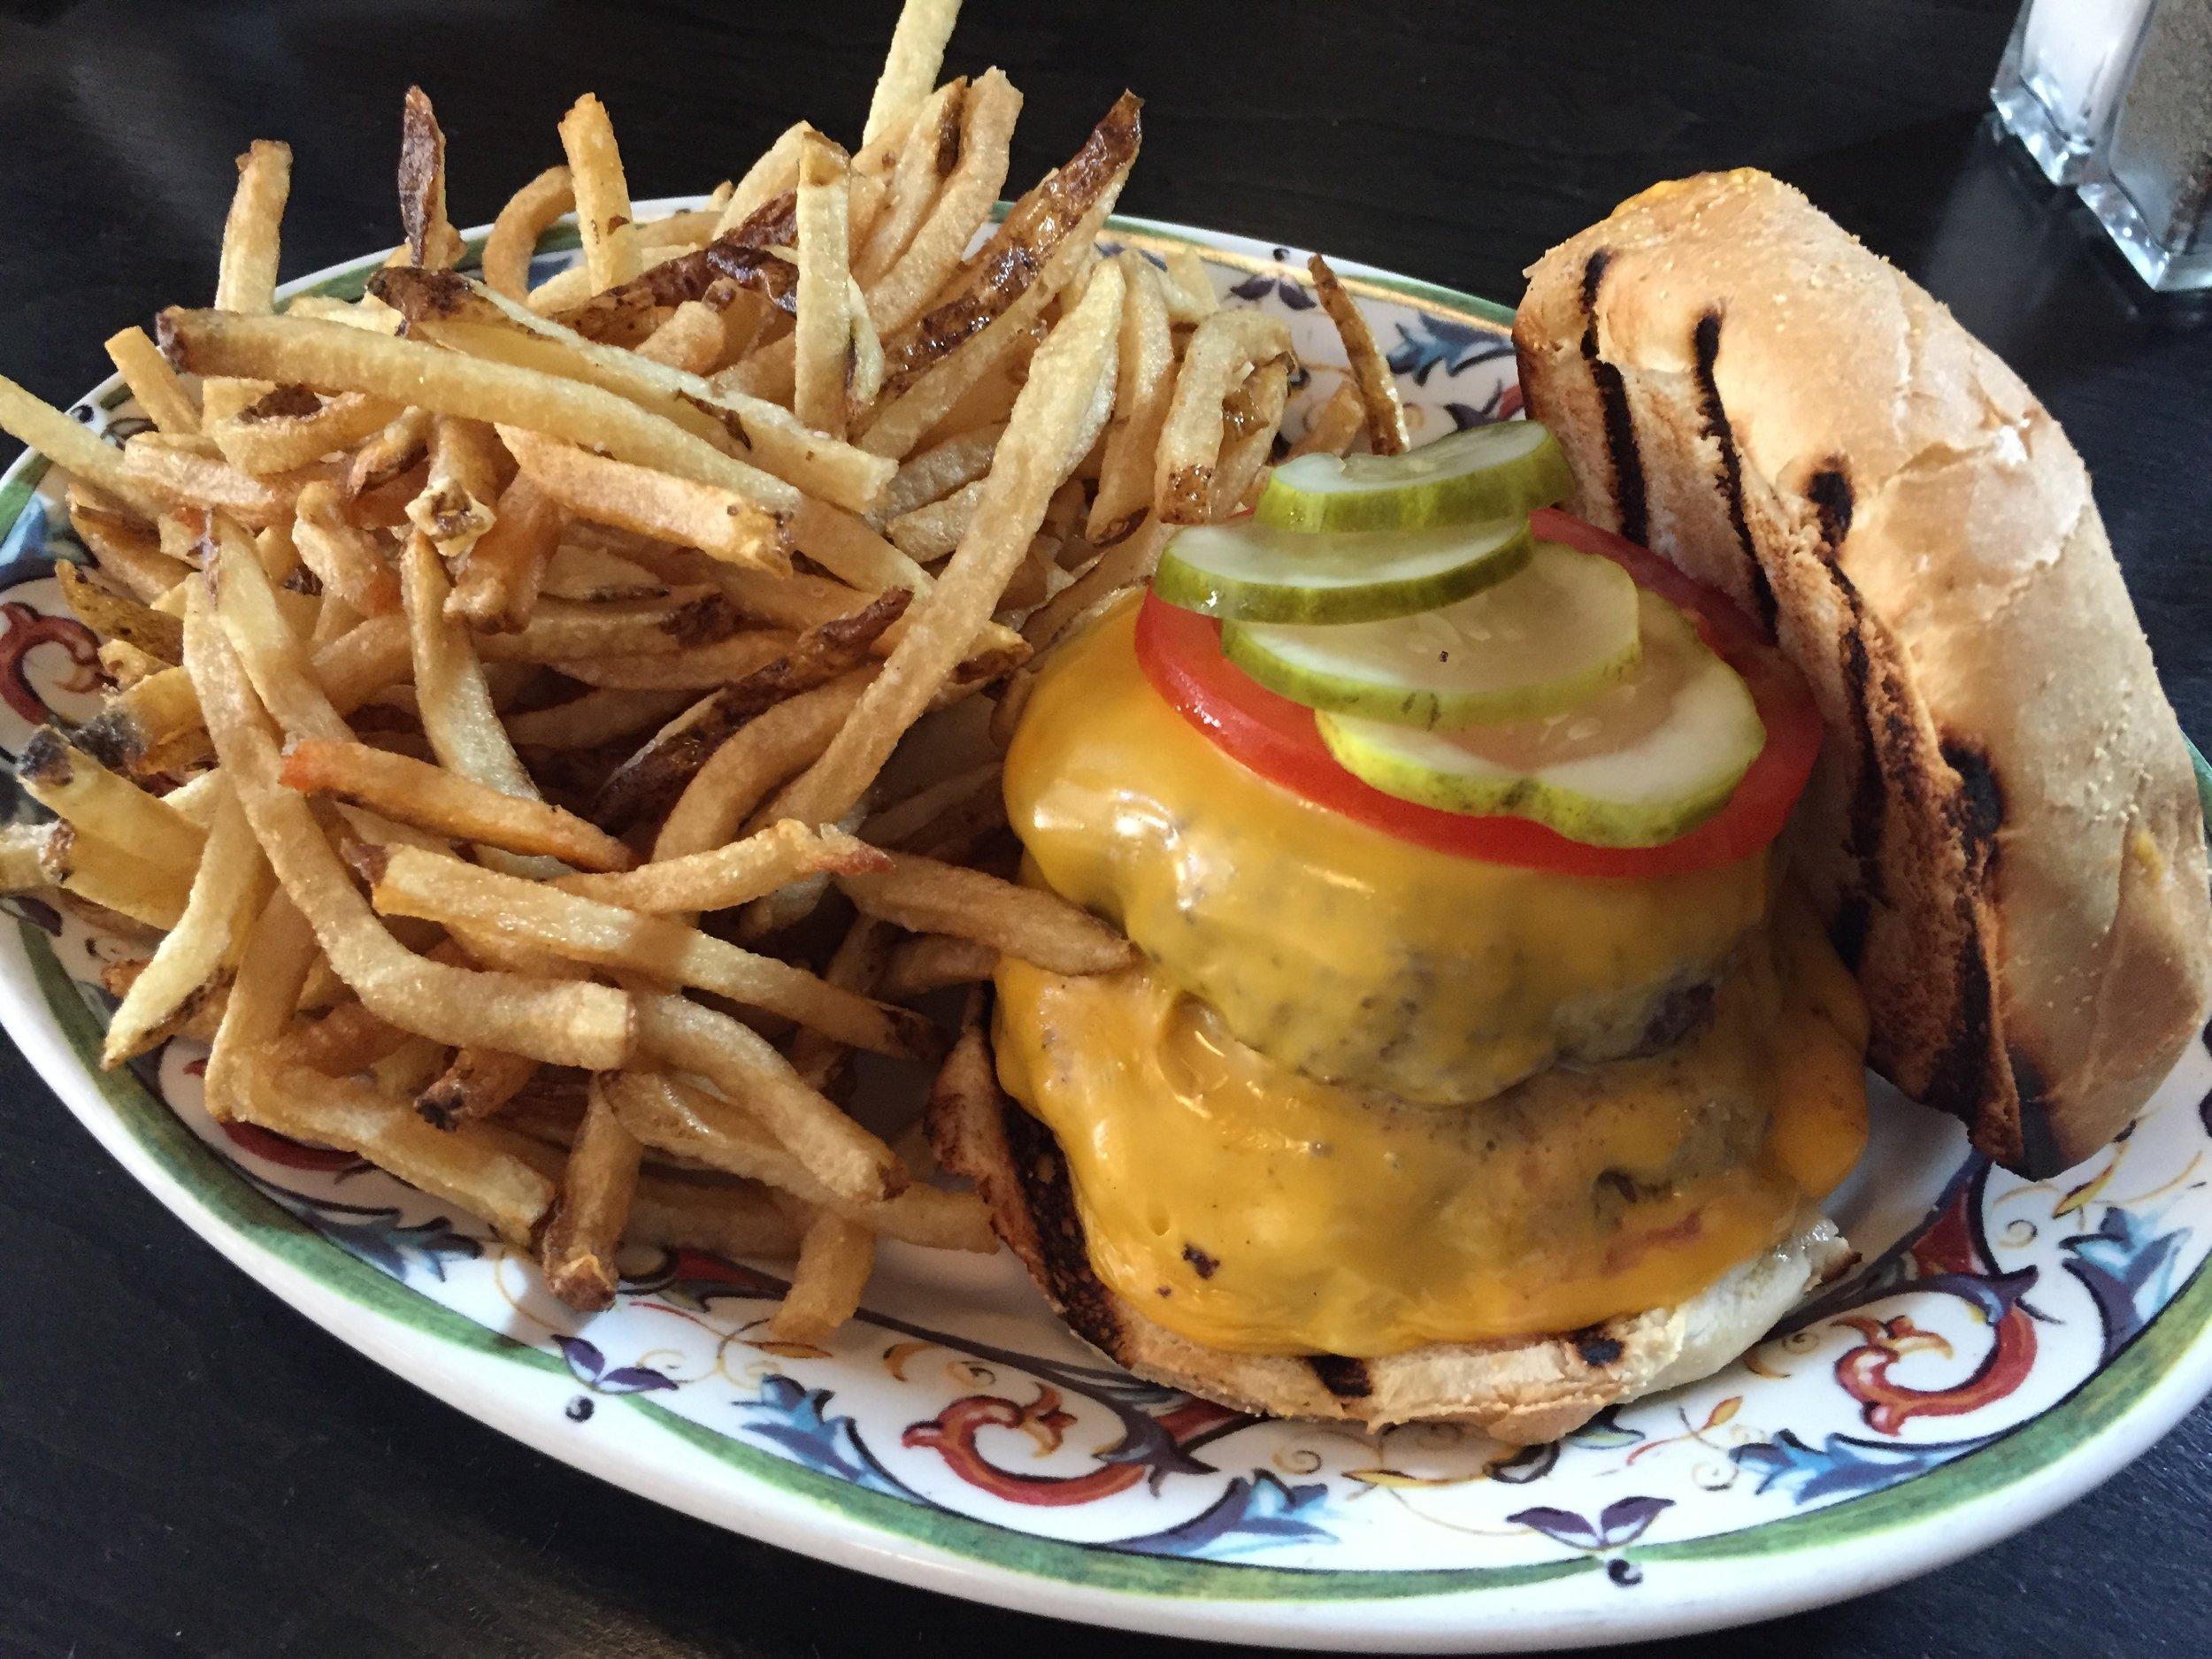 dbl cheeseburger 3.JPG